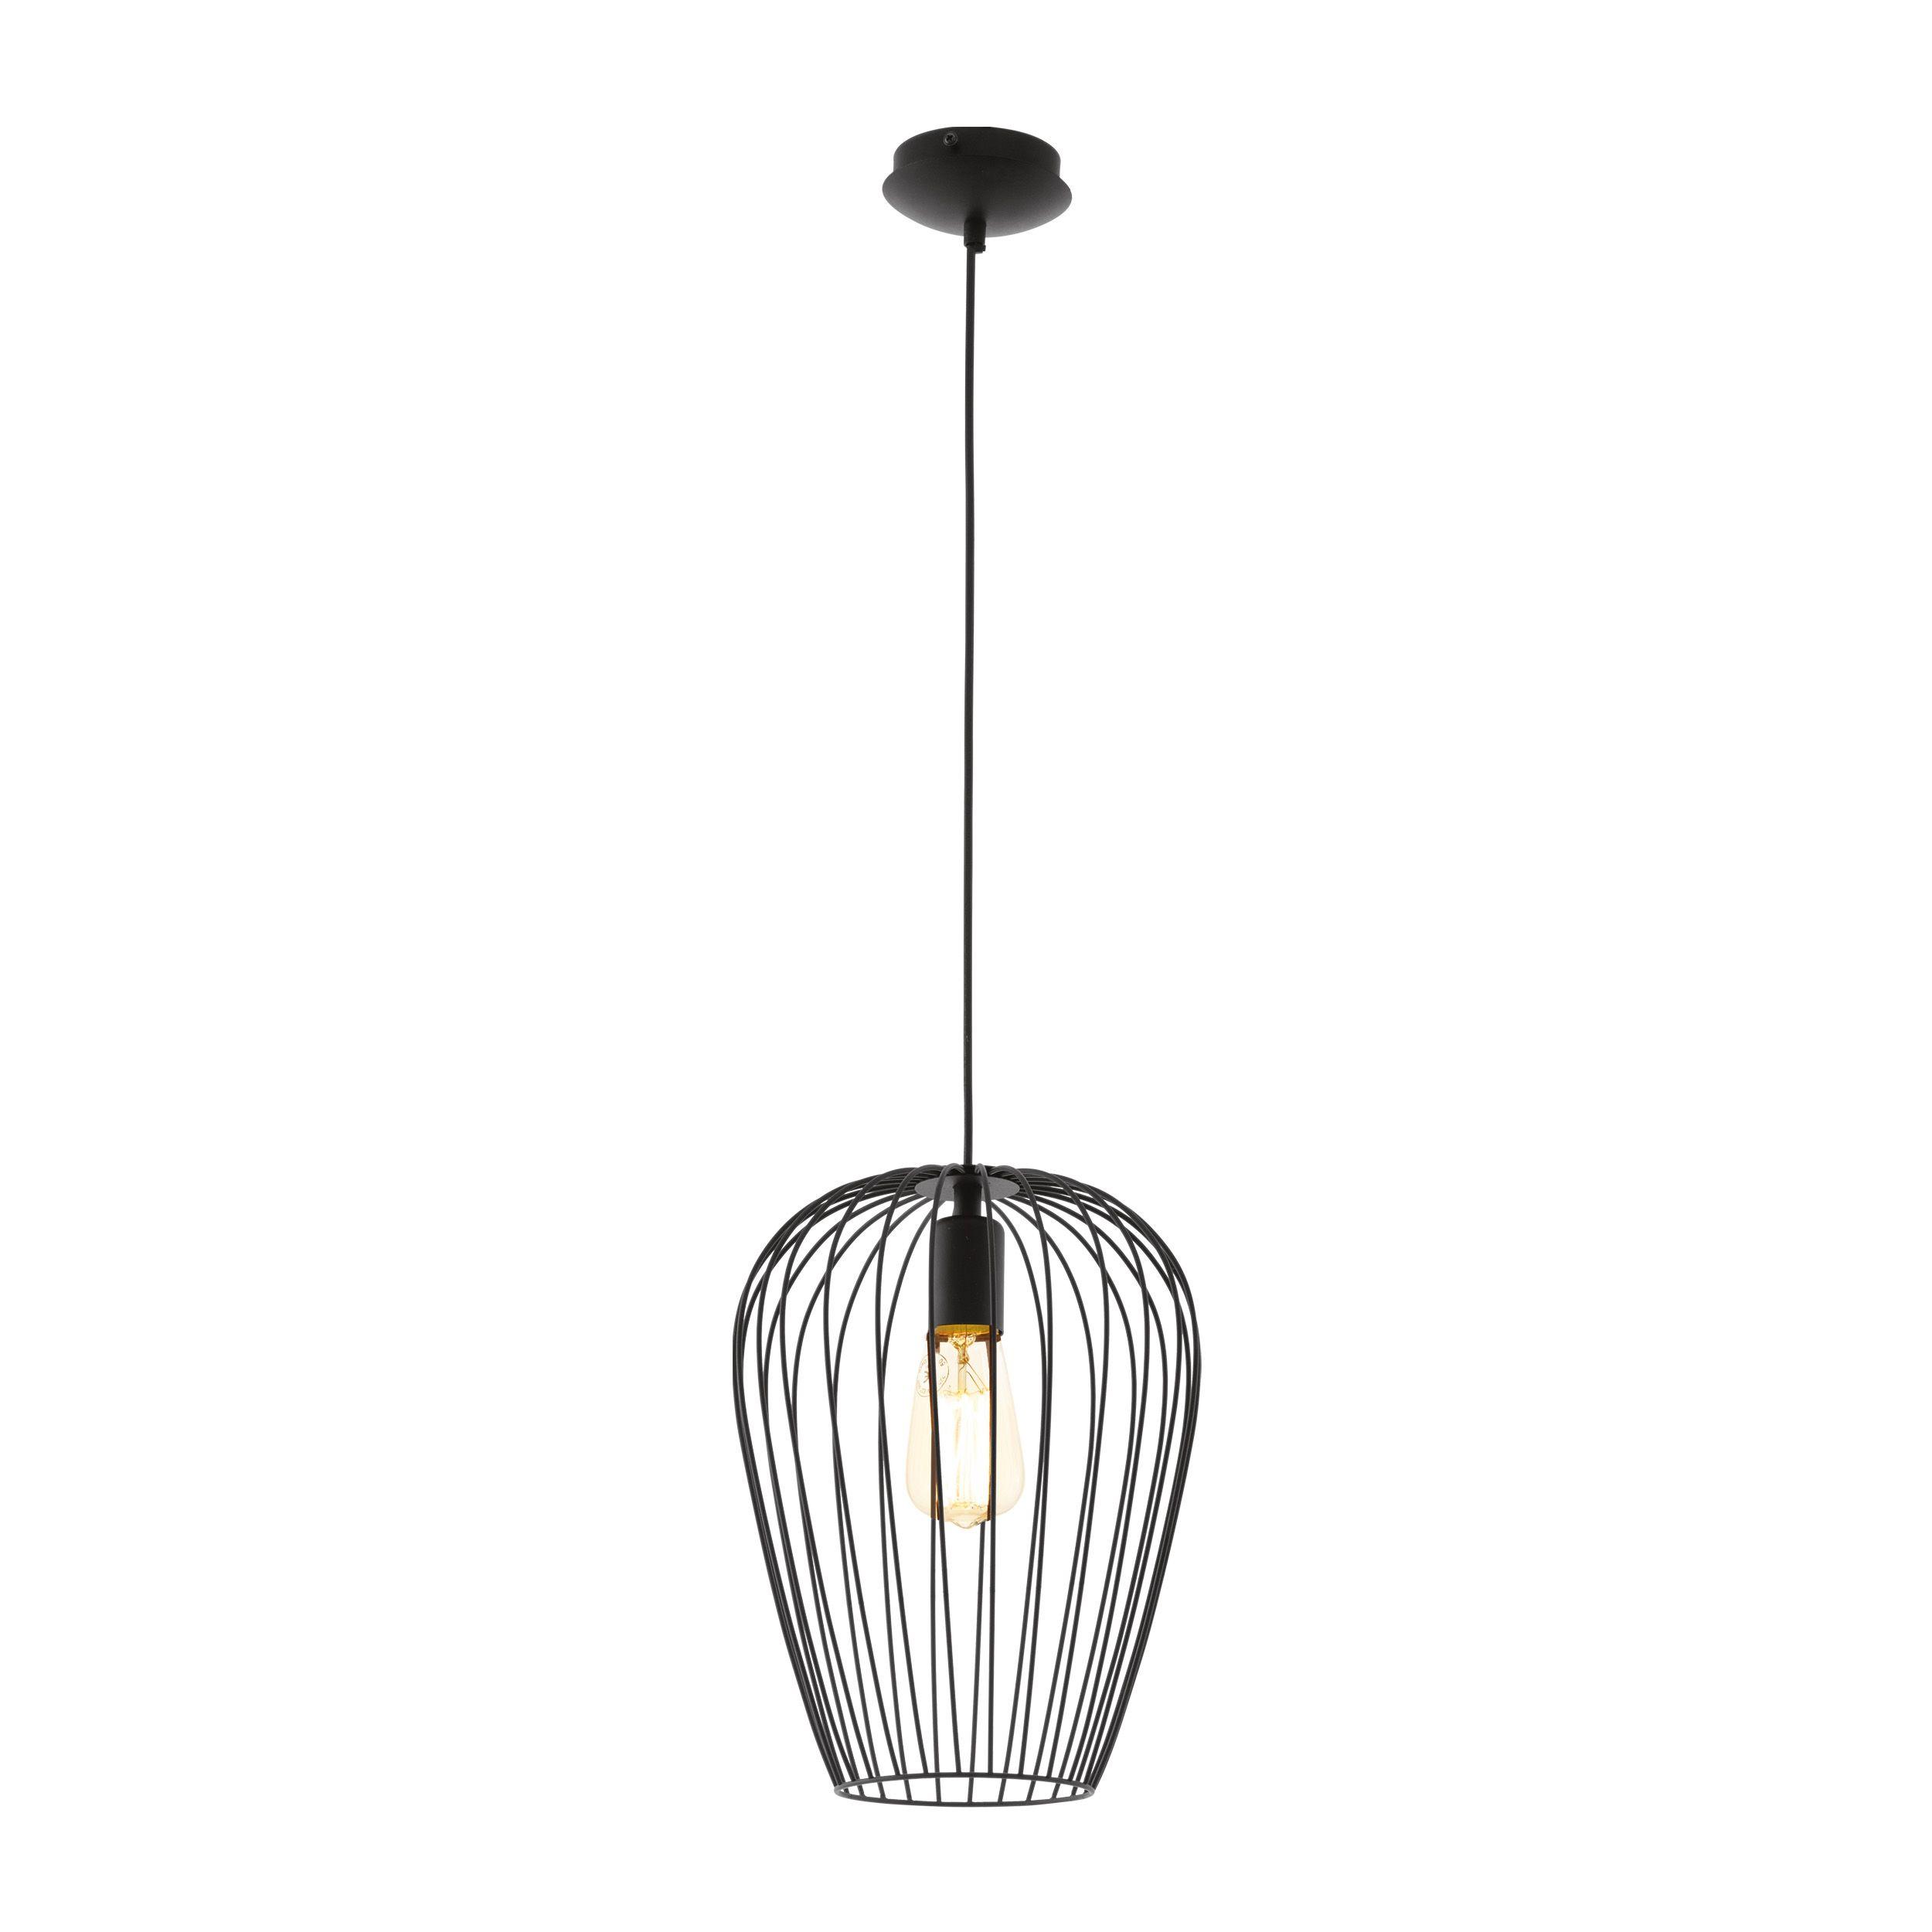 Newtown hanglamp